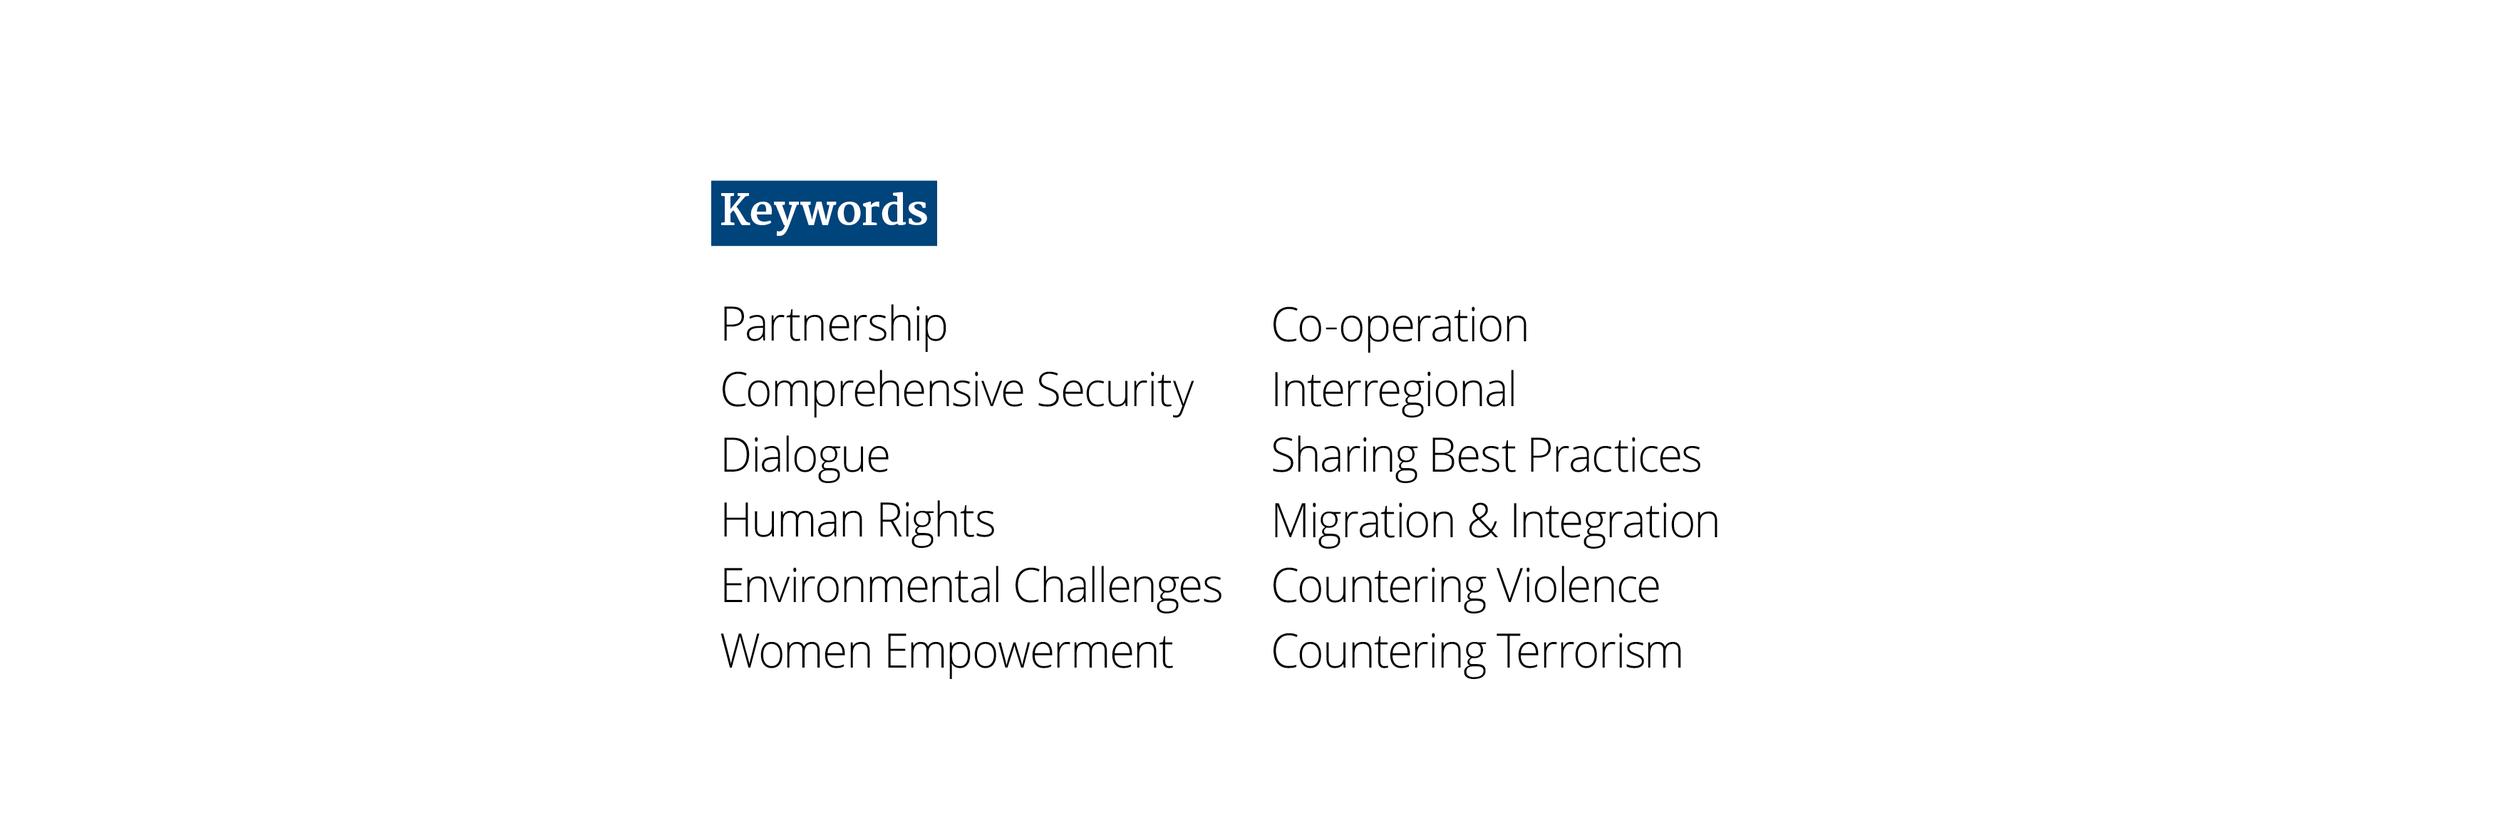 OSCE_Partnership_Logo_Graphic_Charter_3110165.png